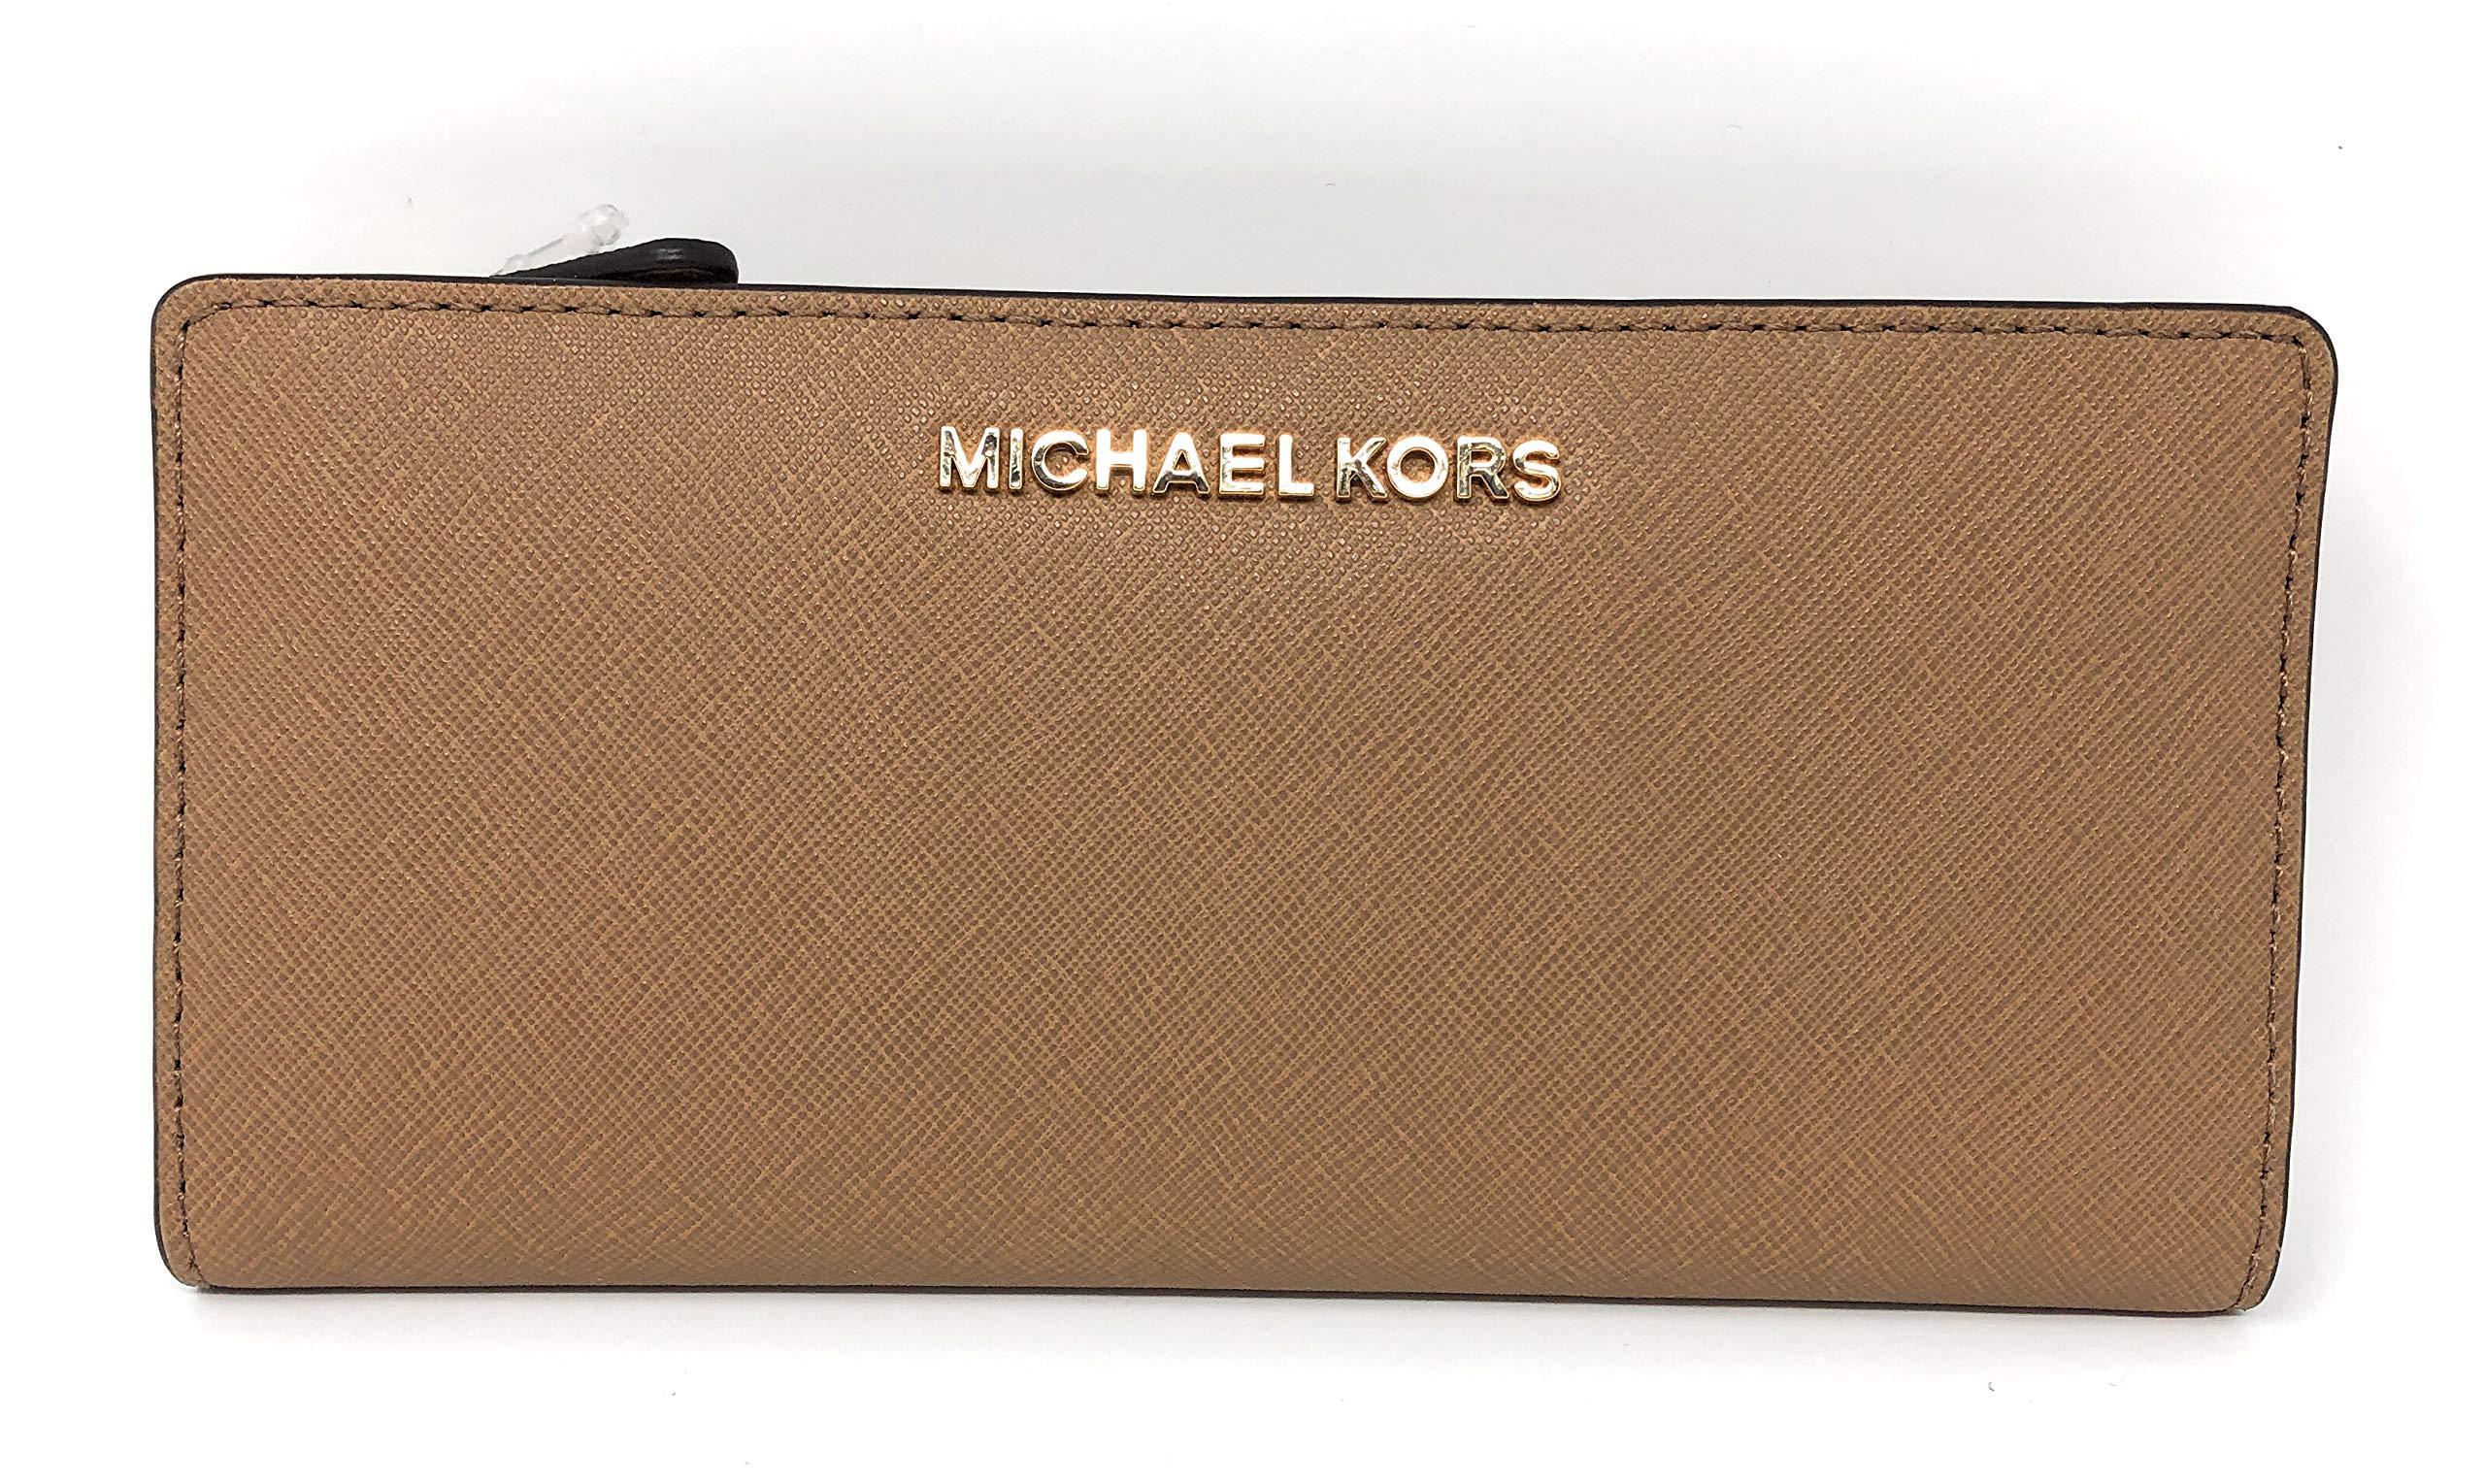 Michael Kors Jet Set Travel Lg Card Case Carryall Wallet in Dk Khaki